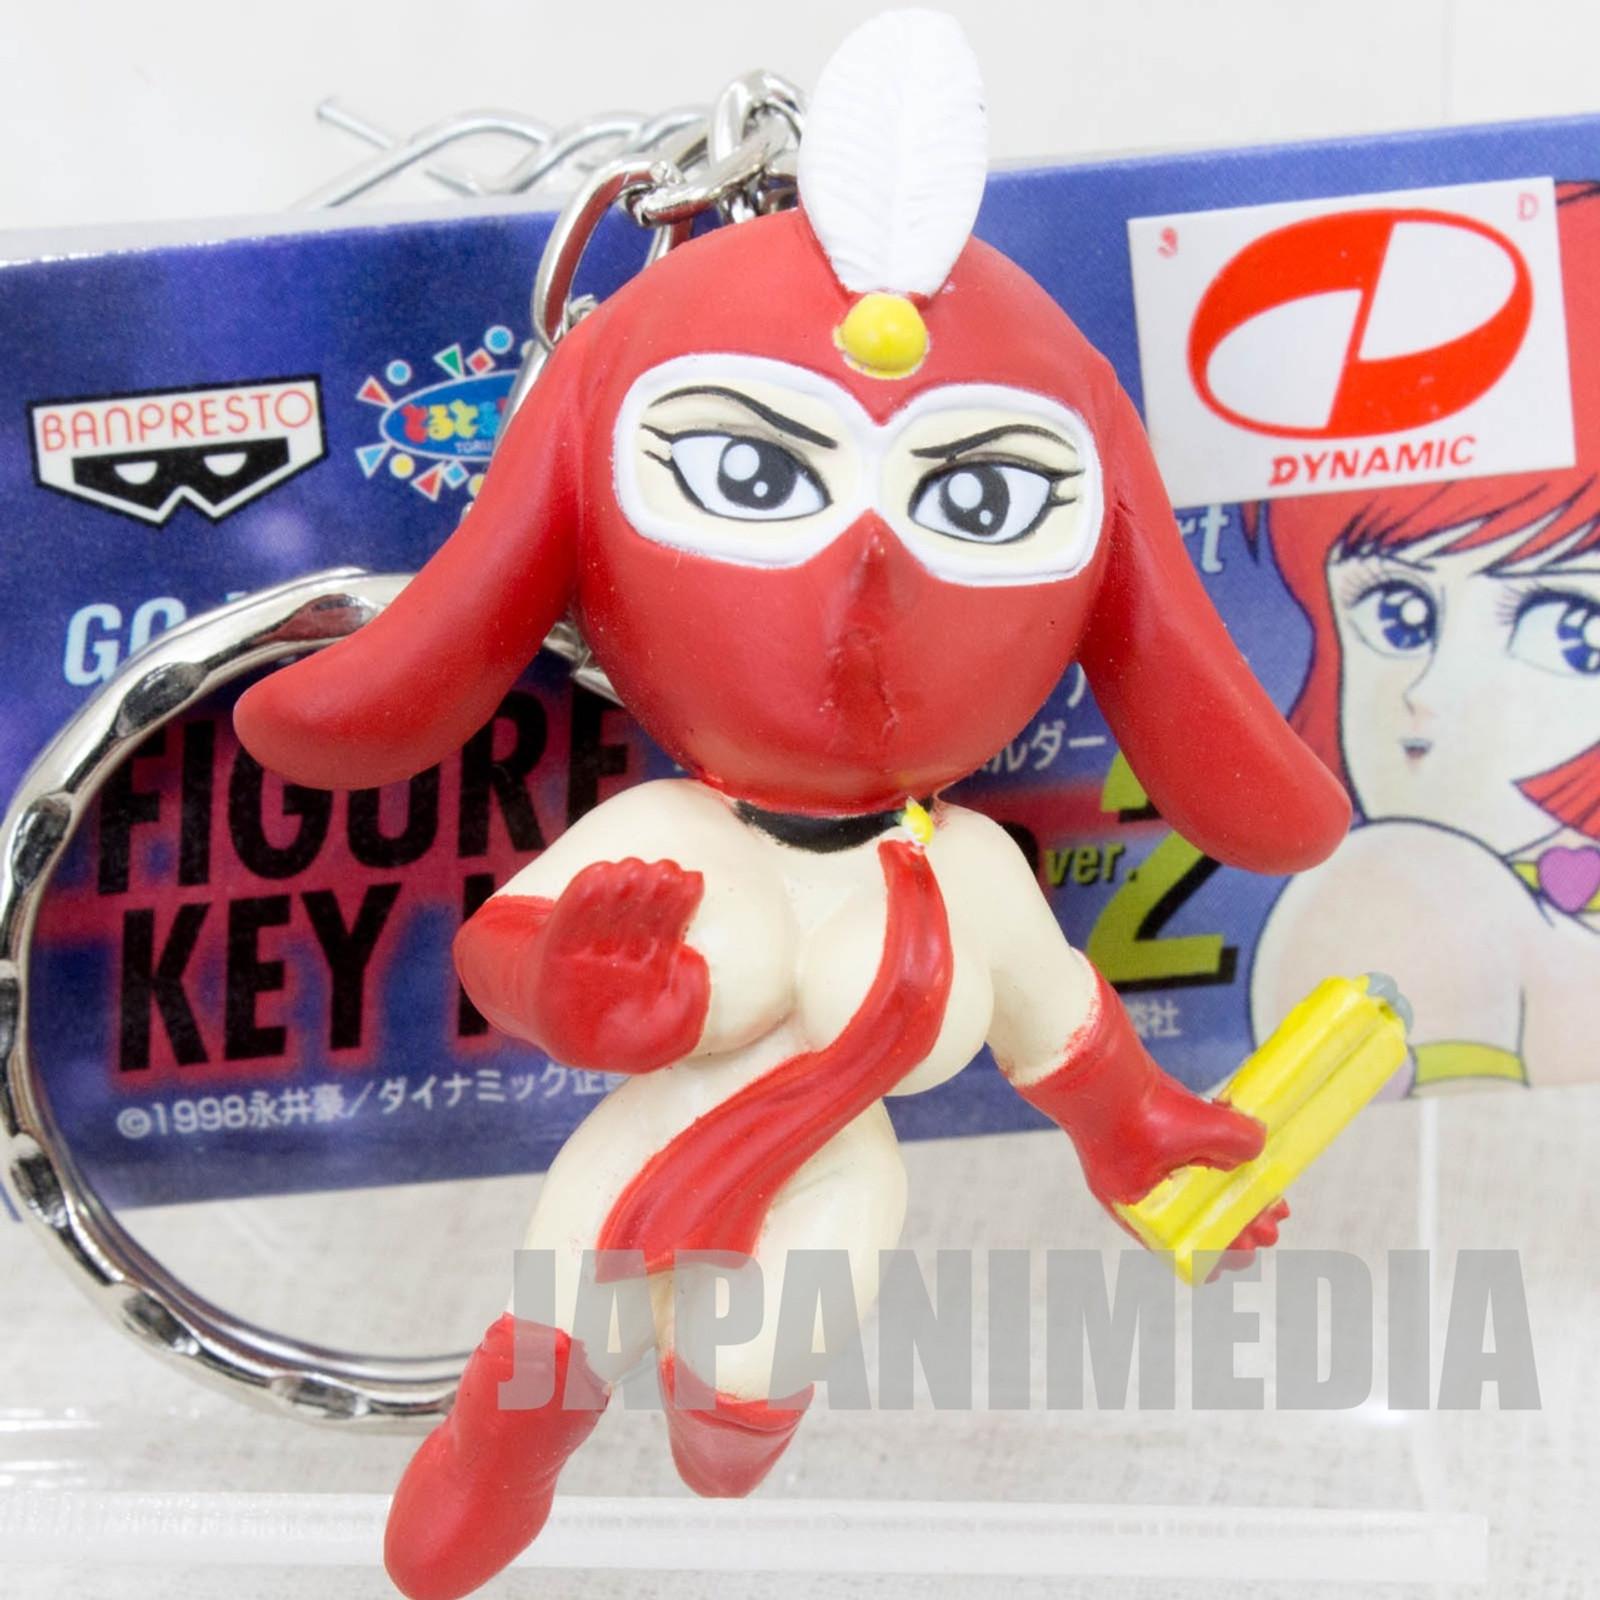 Kekko Kamen Nagai Go Characters Figure Key Chain Banpresto JAPAN ANIME 1